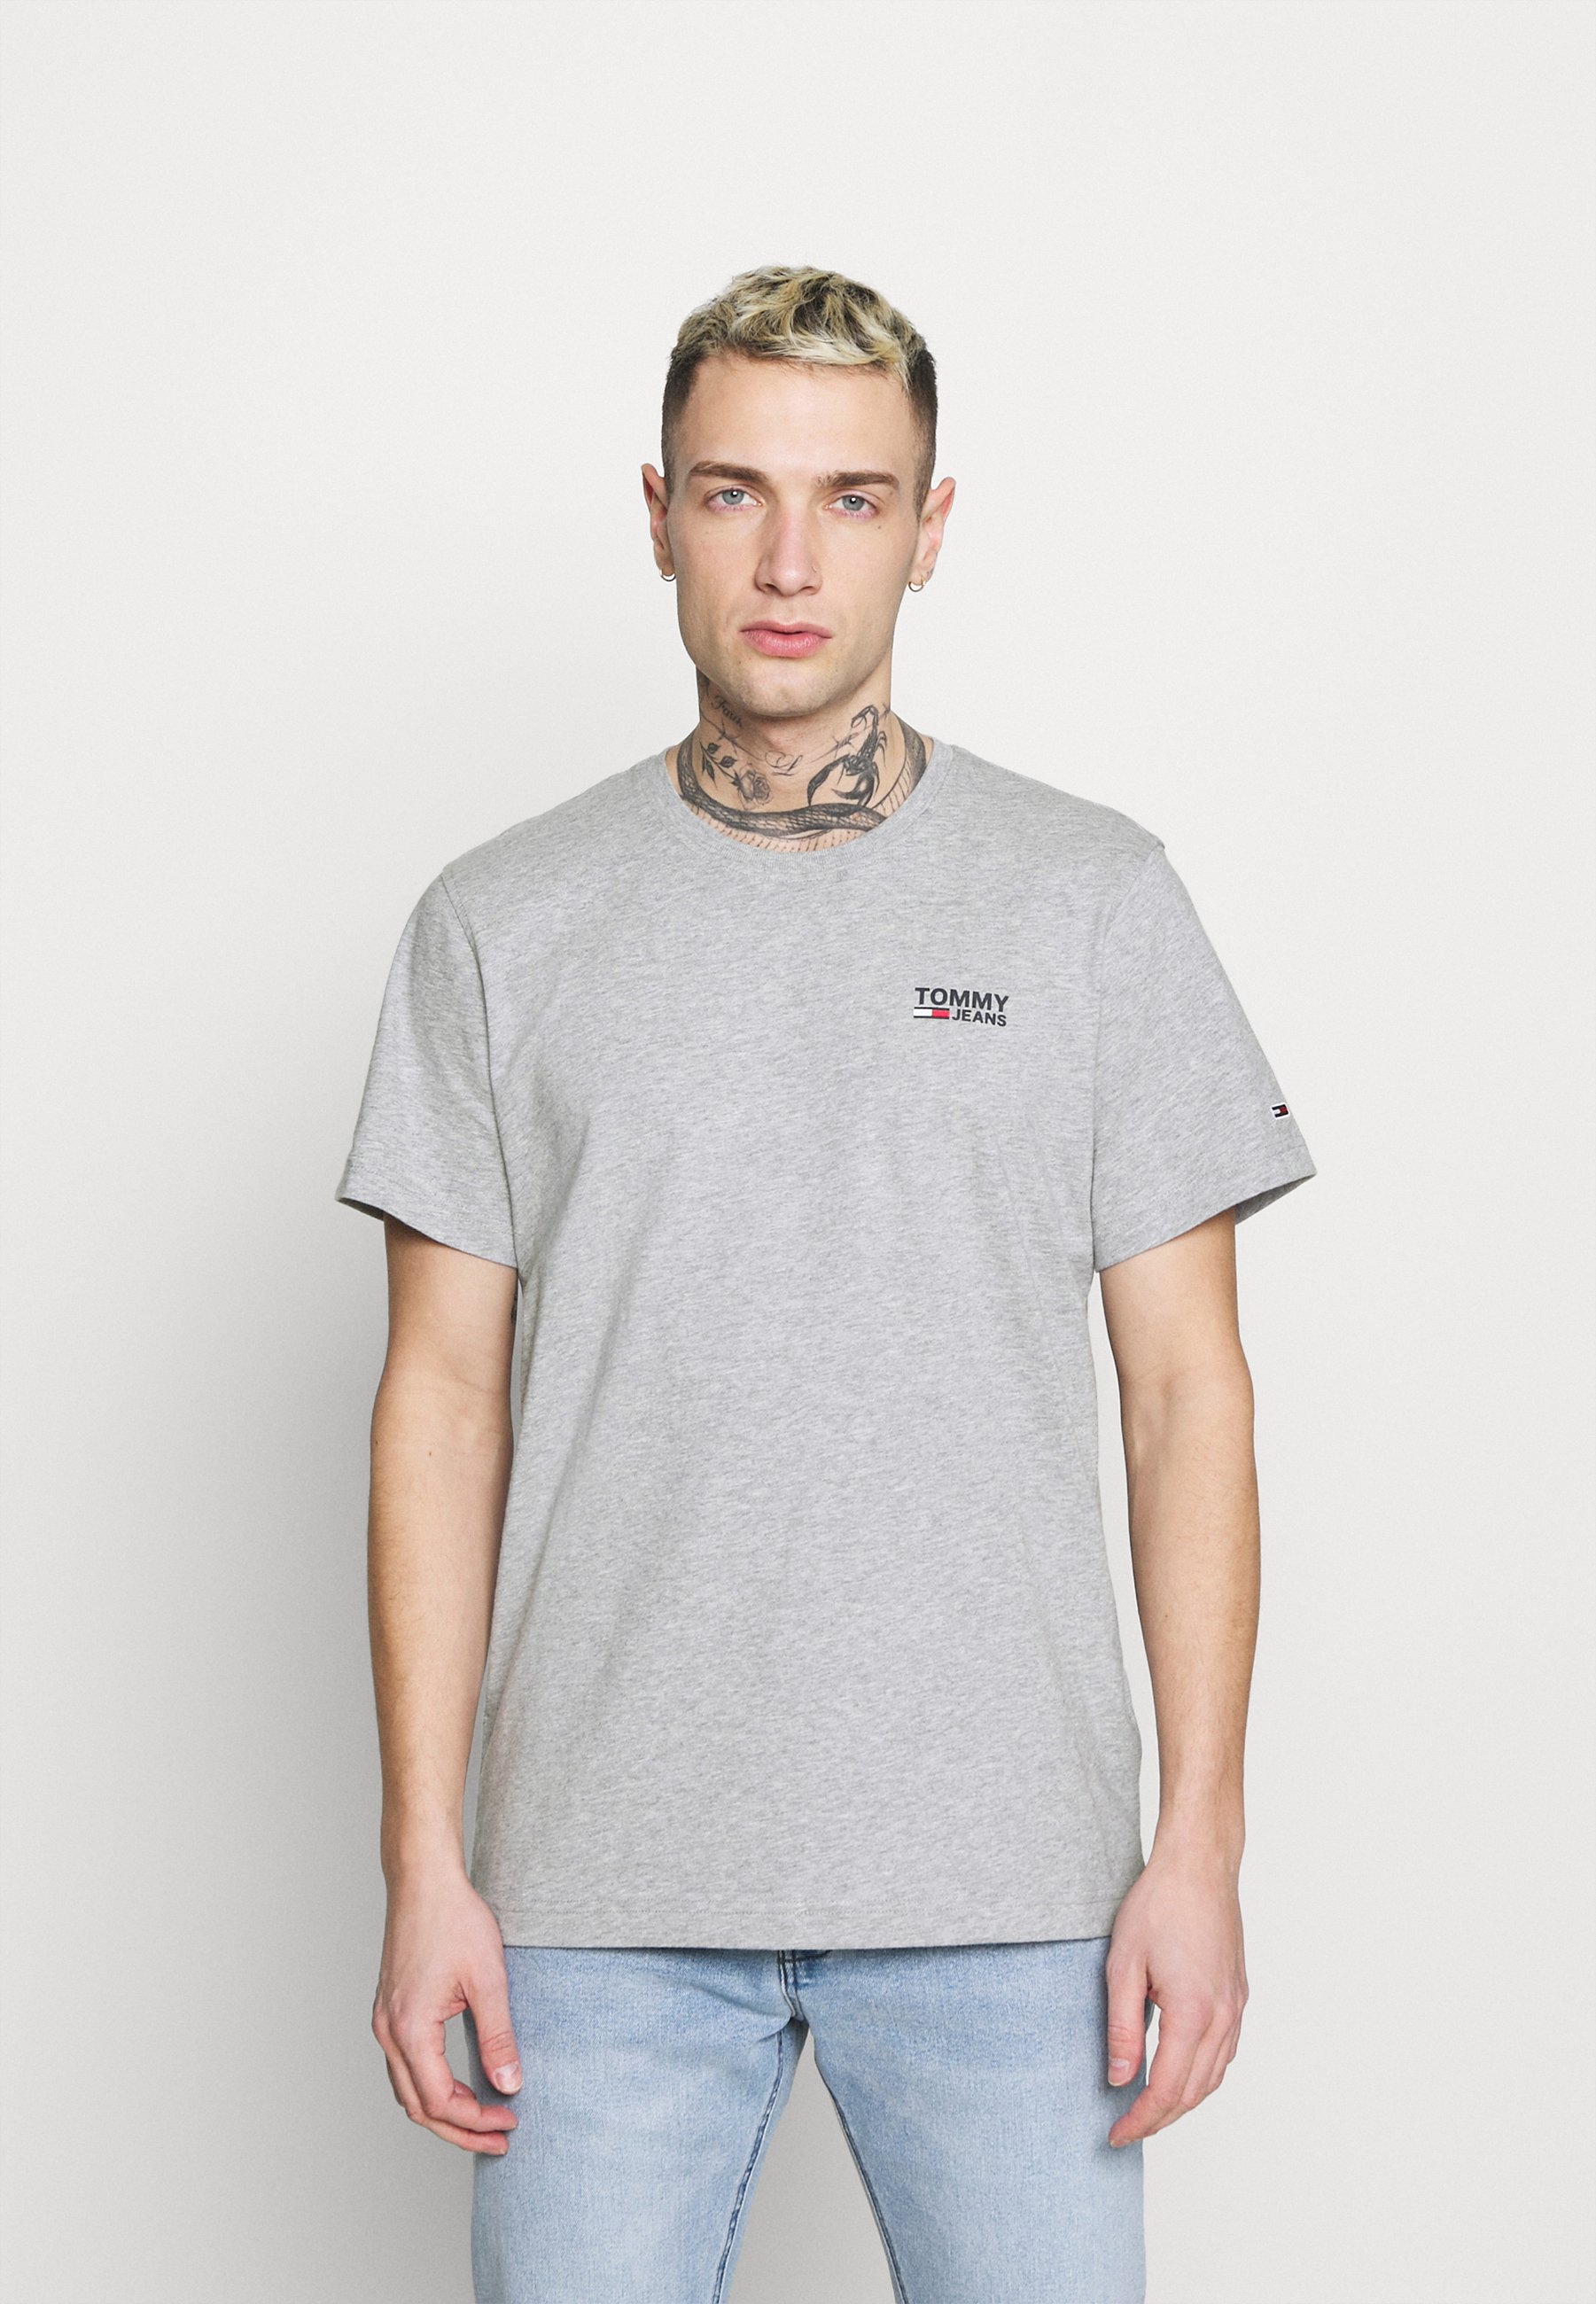 Homme REGULAR CORP LOGO CNECK - T-shirt basique